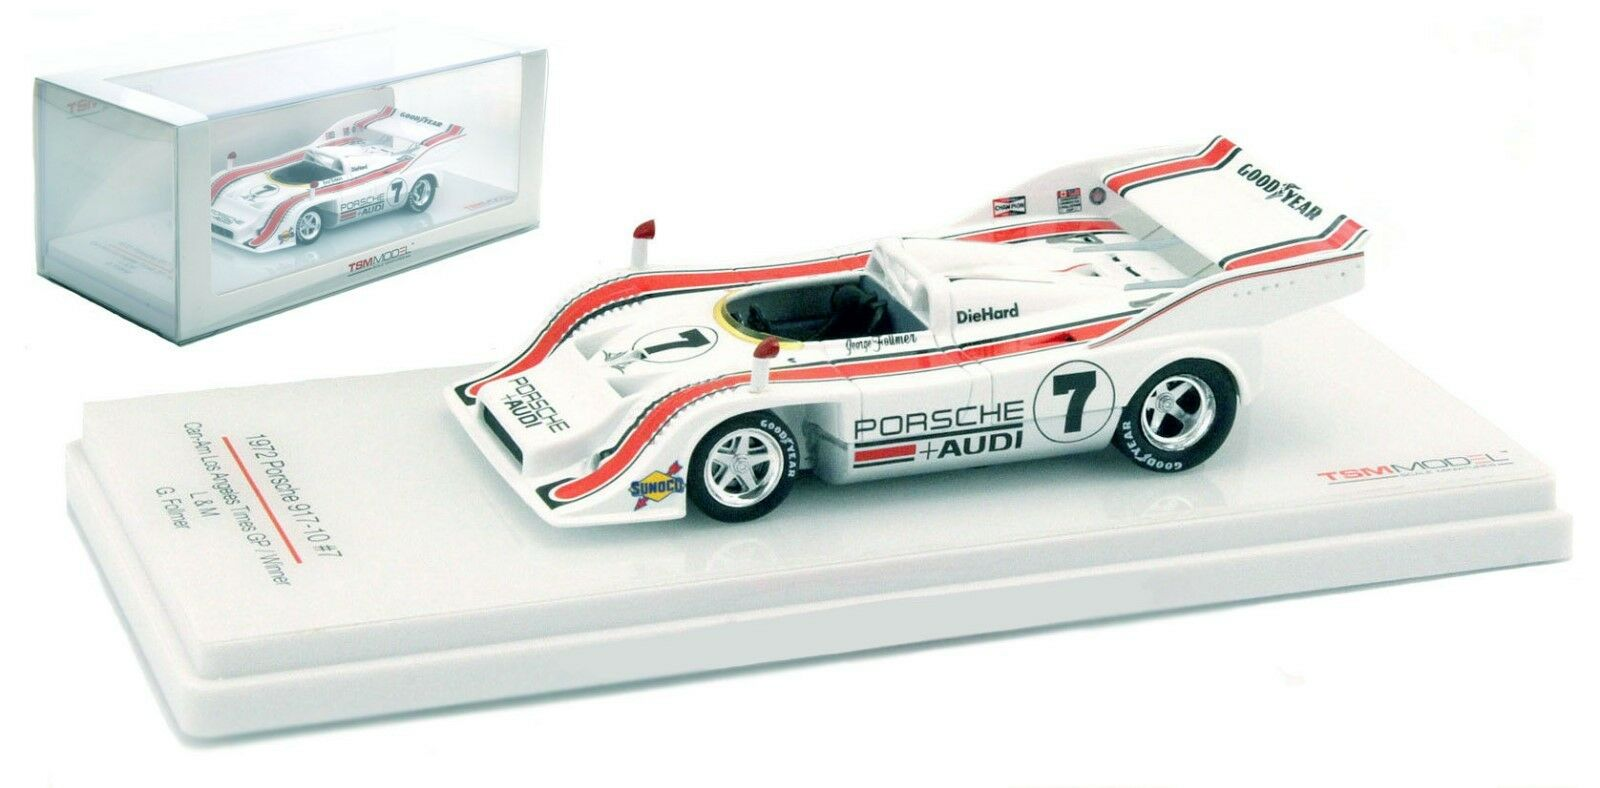 TRUESCALE Porsche 917 10  7 CAN AM CHAMPION 1972-George Follmer échelle 1 43